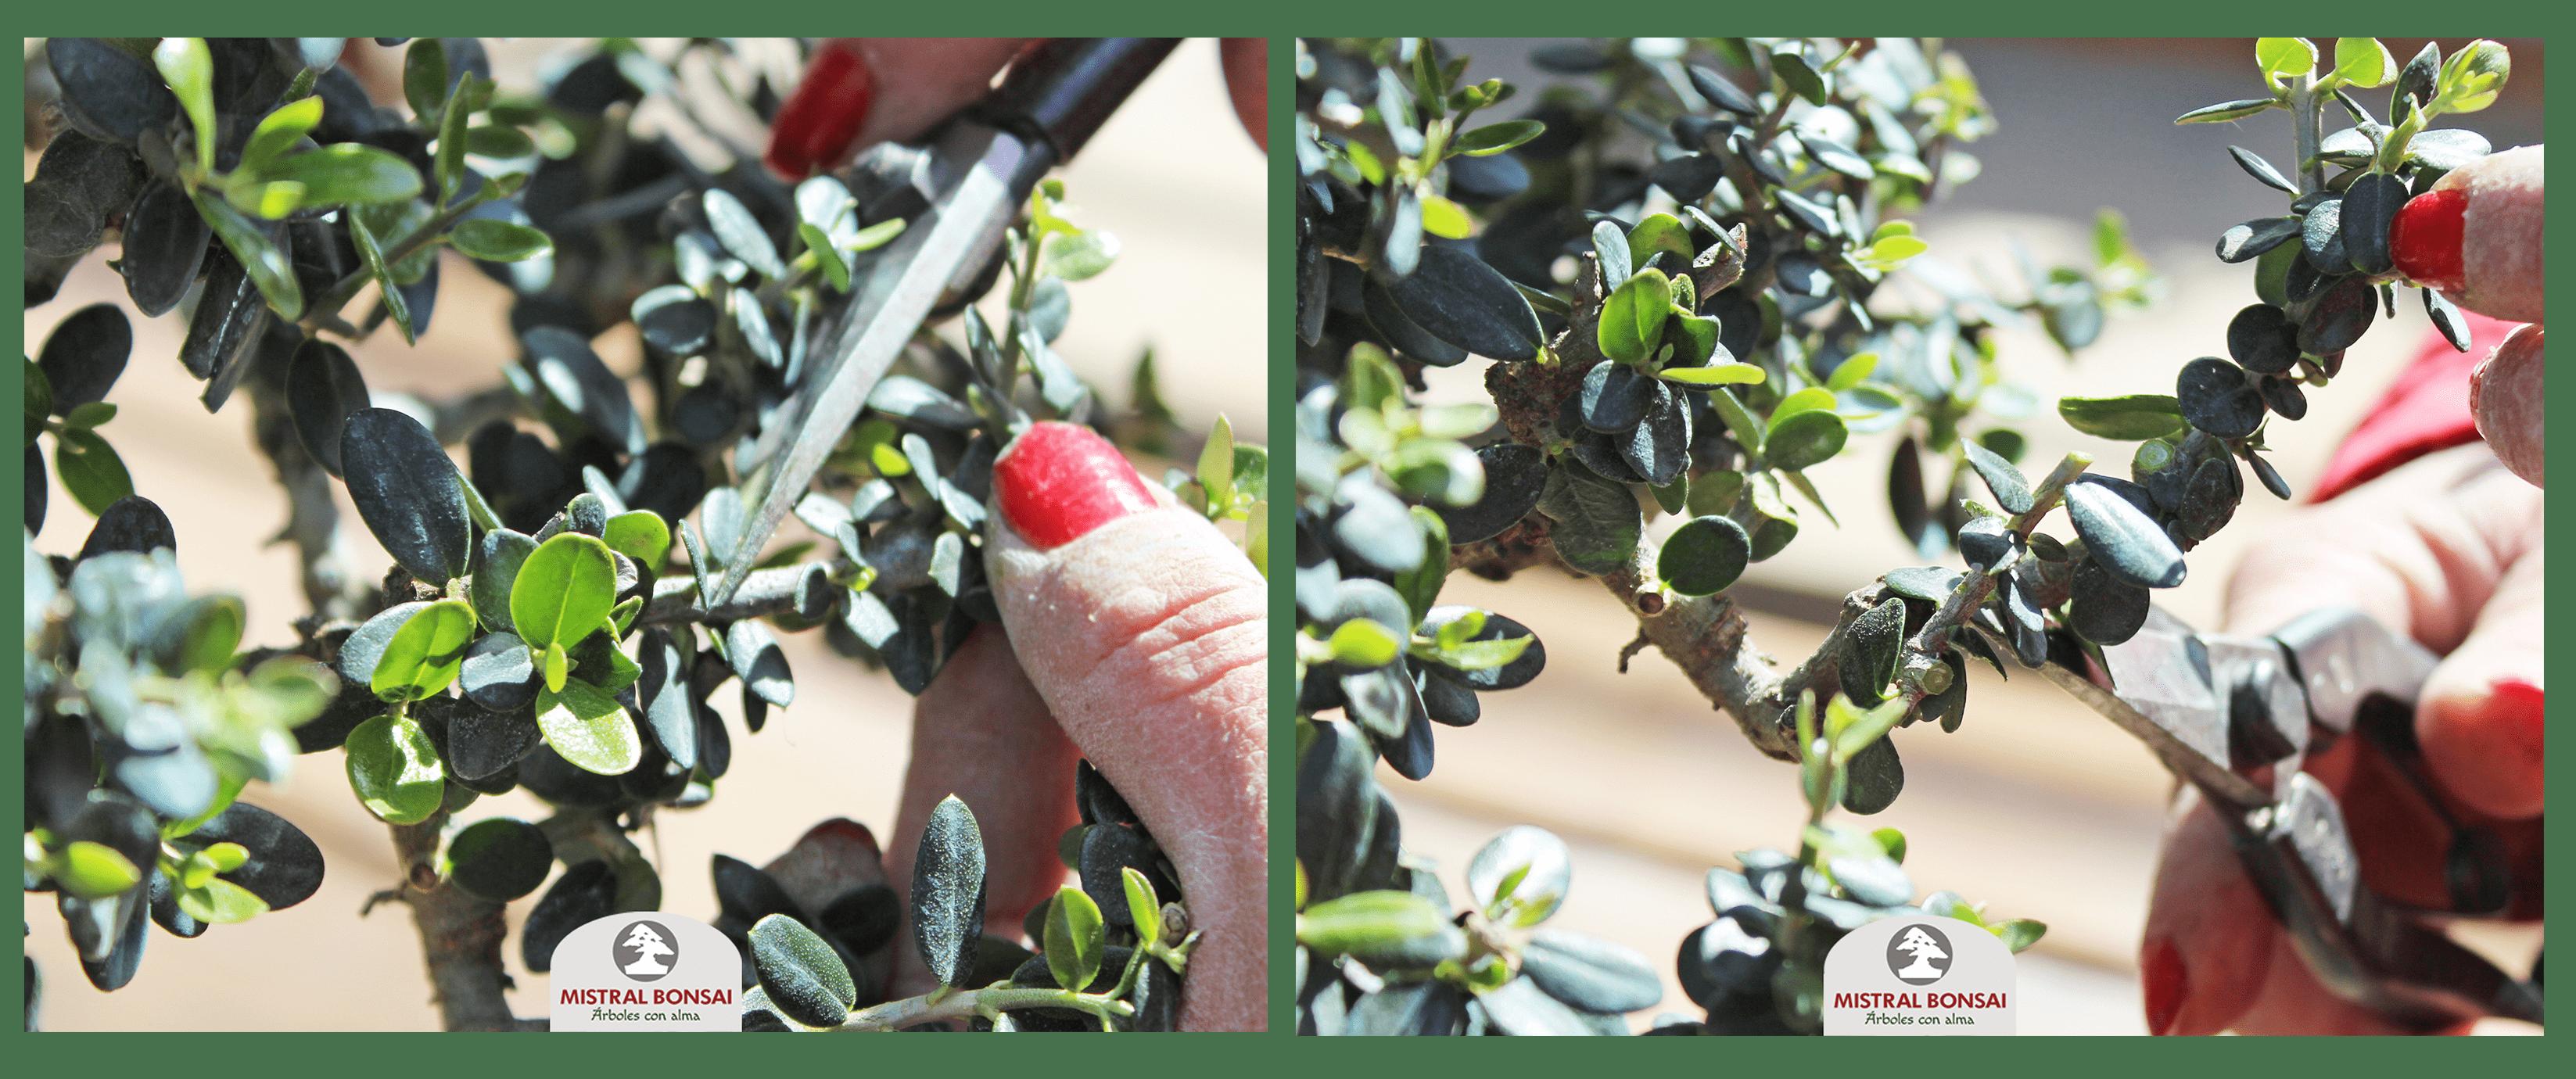 Poda de aclarado bonsái 1